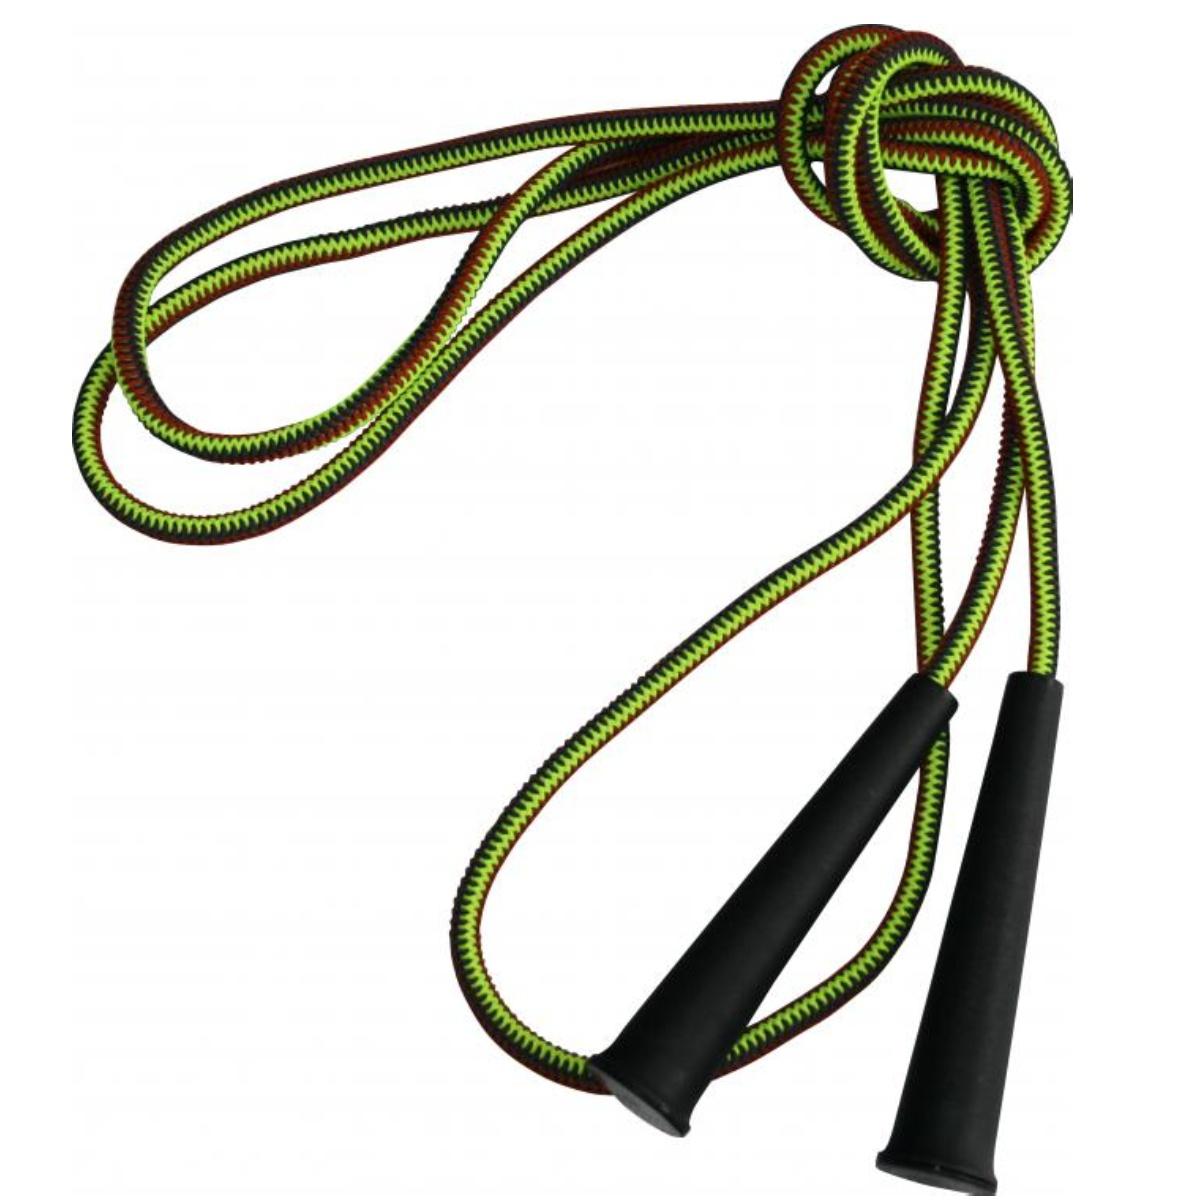 Gymnastické švihadlo elastické 5 metrů